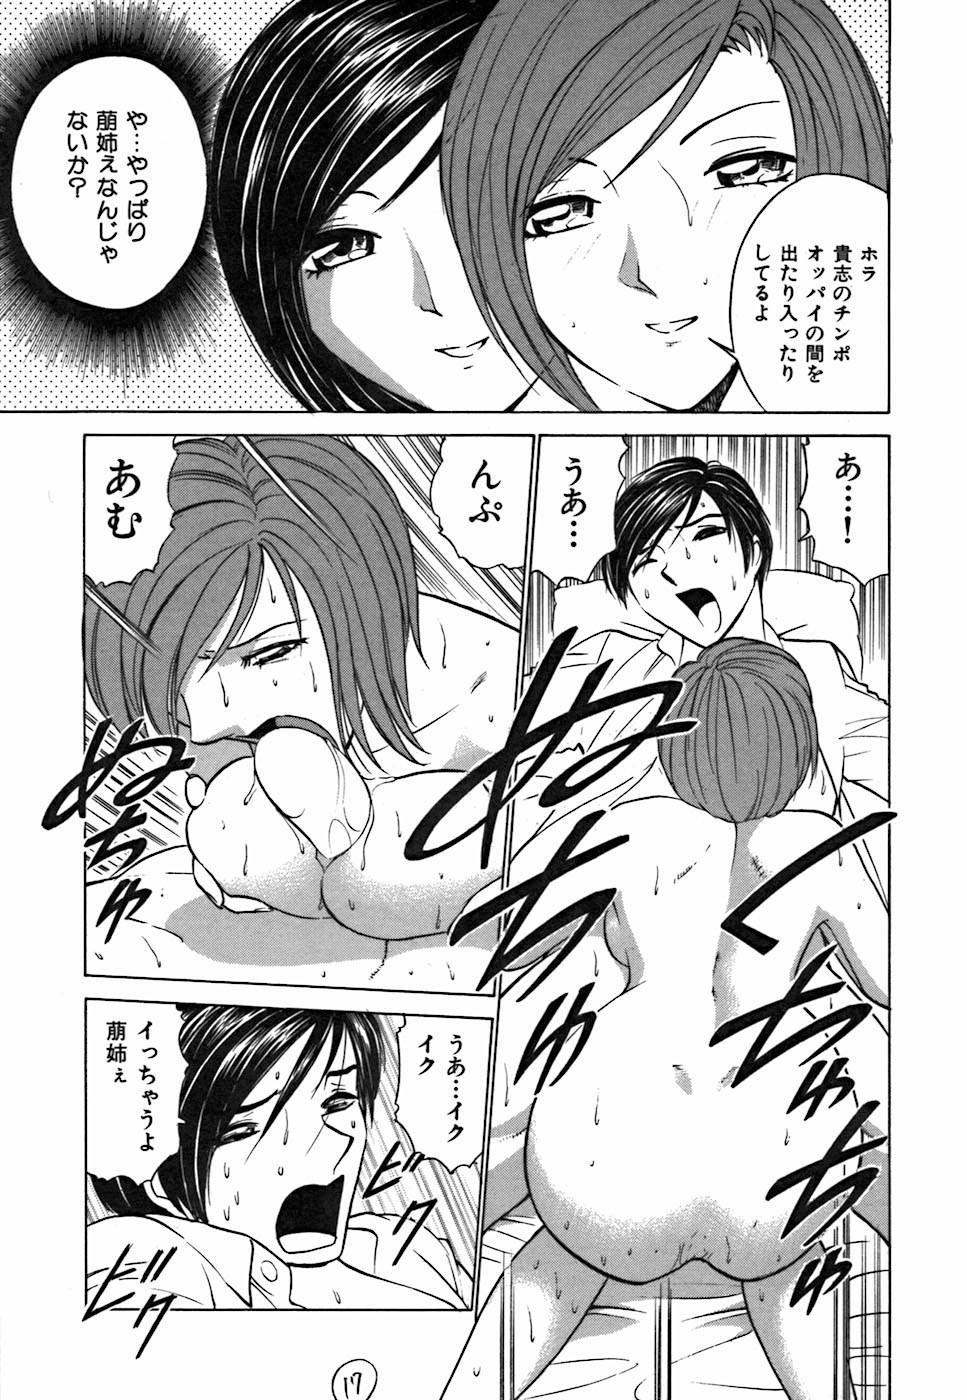 Kimi ga Nozomu Katachi | Appearance for which you hope 158